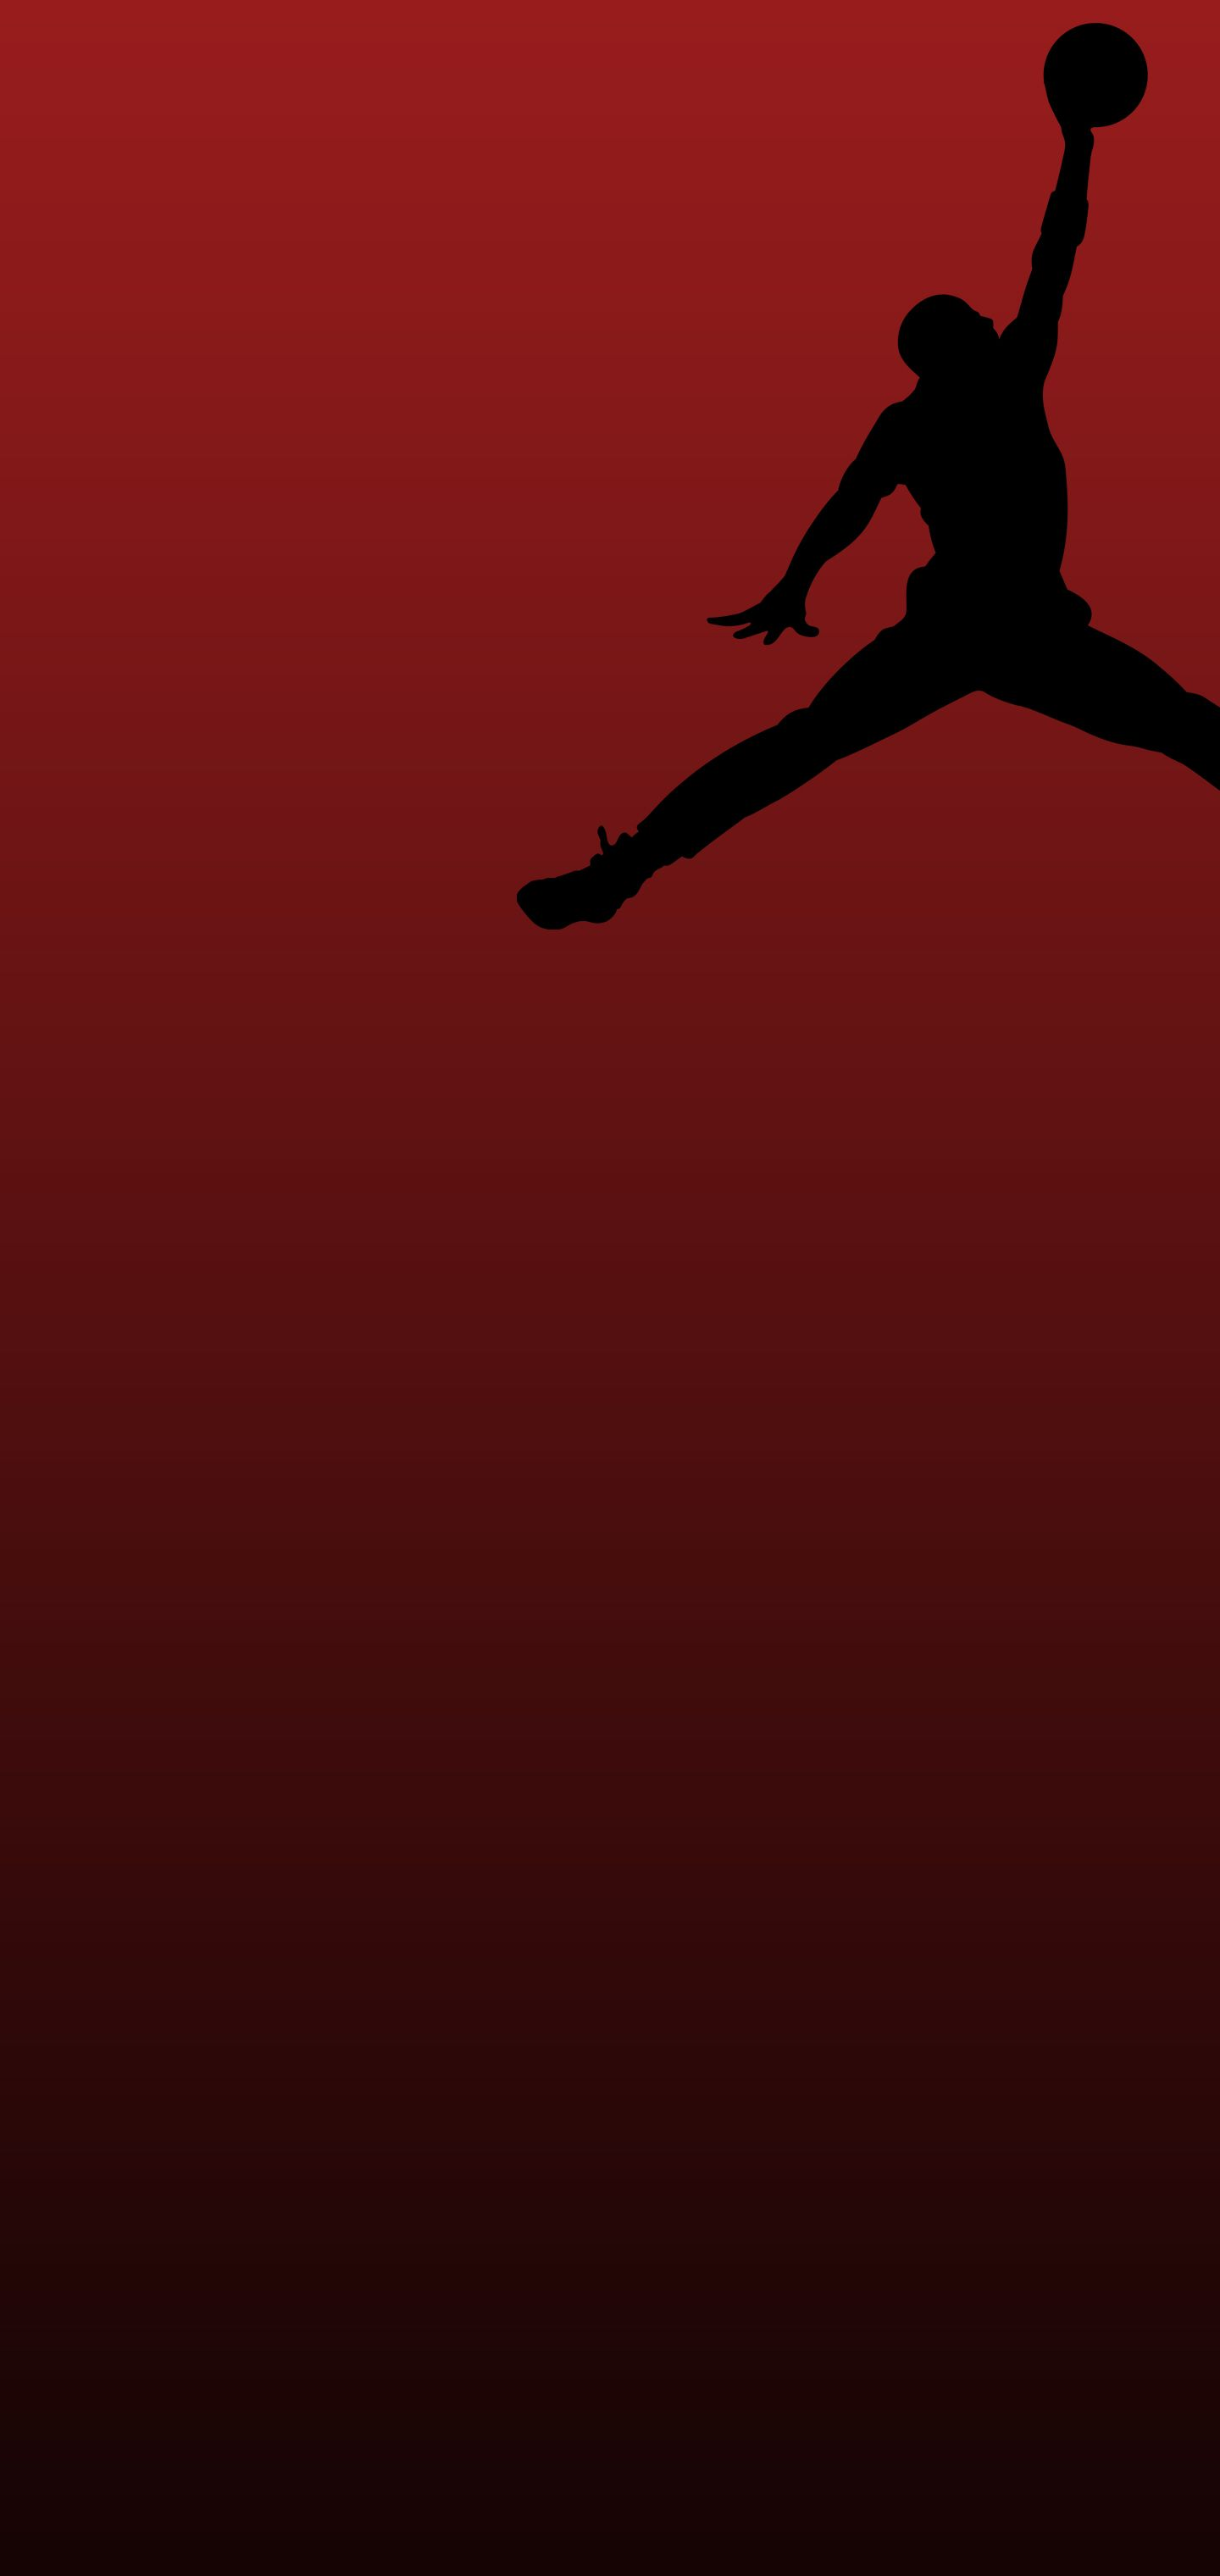 Michael Jordan Wallpaper Fondos De Pantalla S10 Jordan 768x1621 Download Hd Wallpaper Wallpapertip